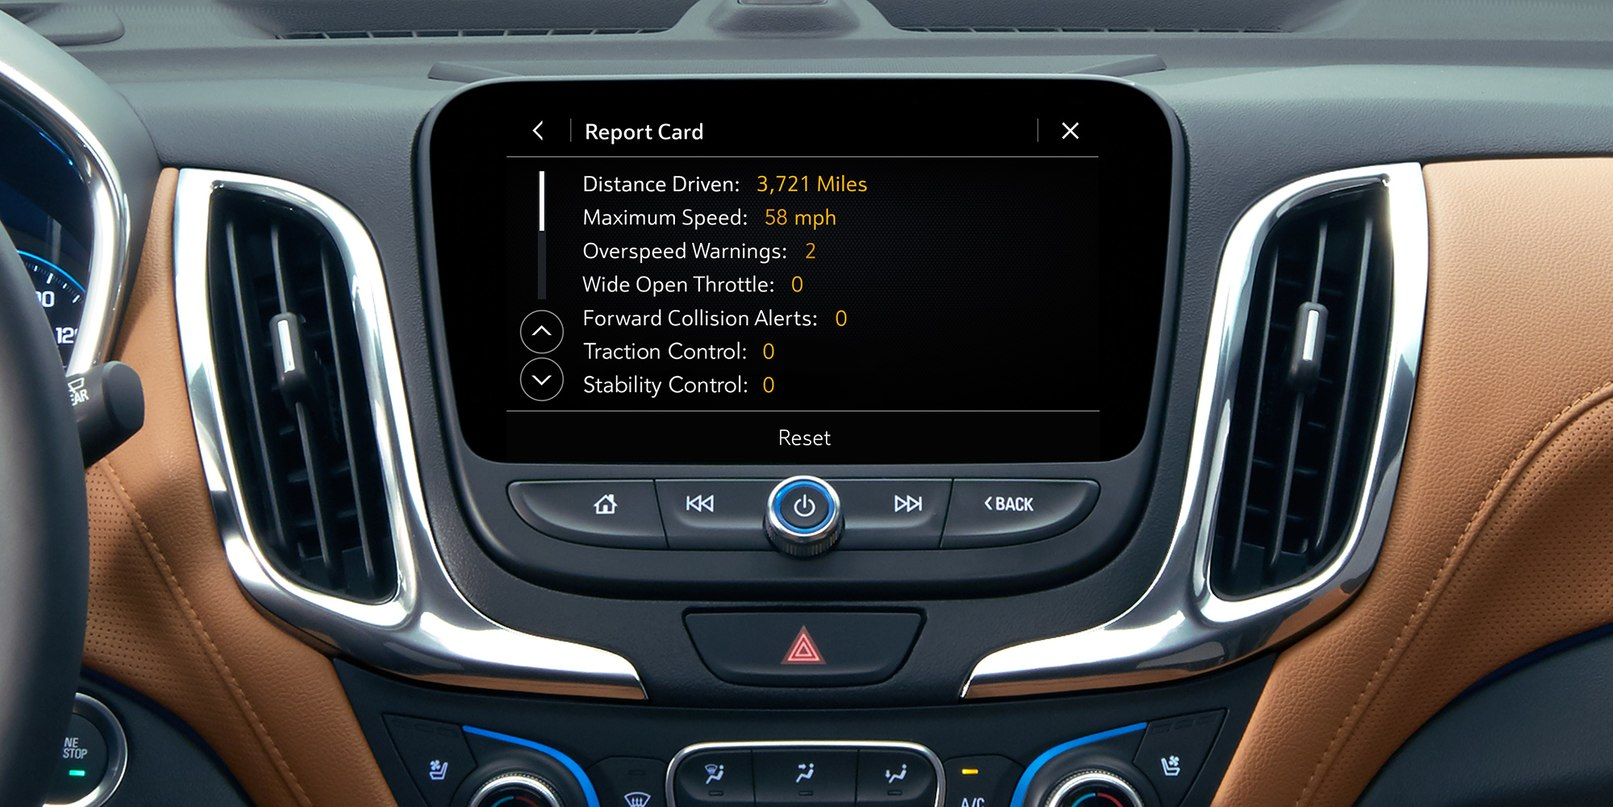 2019 Chevrolet Equinox Center Console